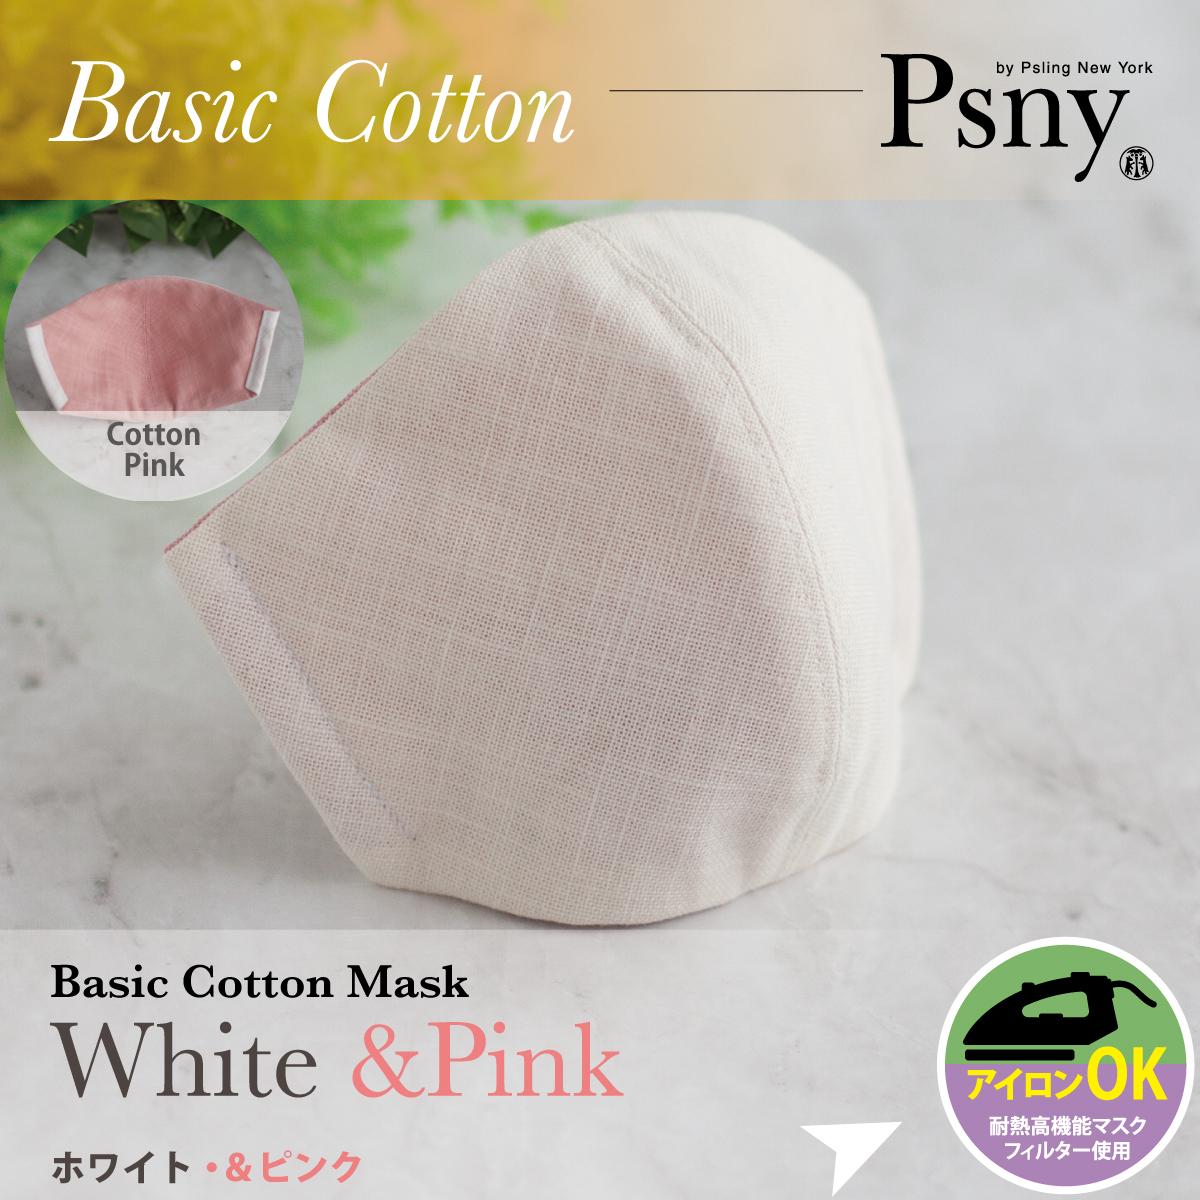 PSNY ベーシック コットン・オフホワイト&ピンク 花粉 黄砂 洗える不織布フィルター入り 立体 大人用 CW1 マスク 送料無料 CW1